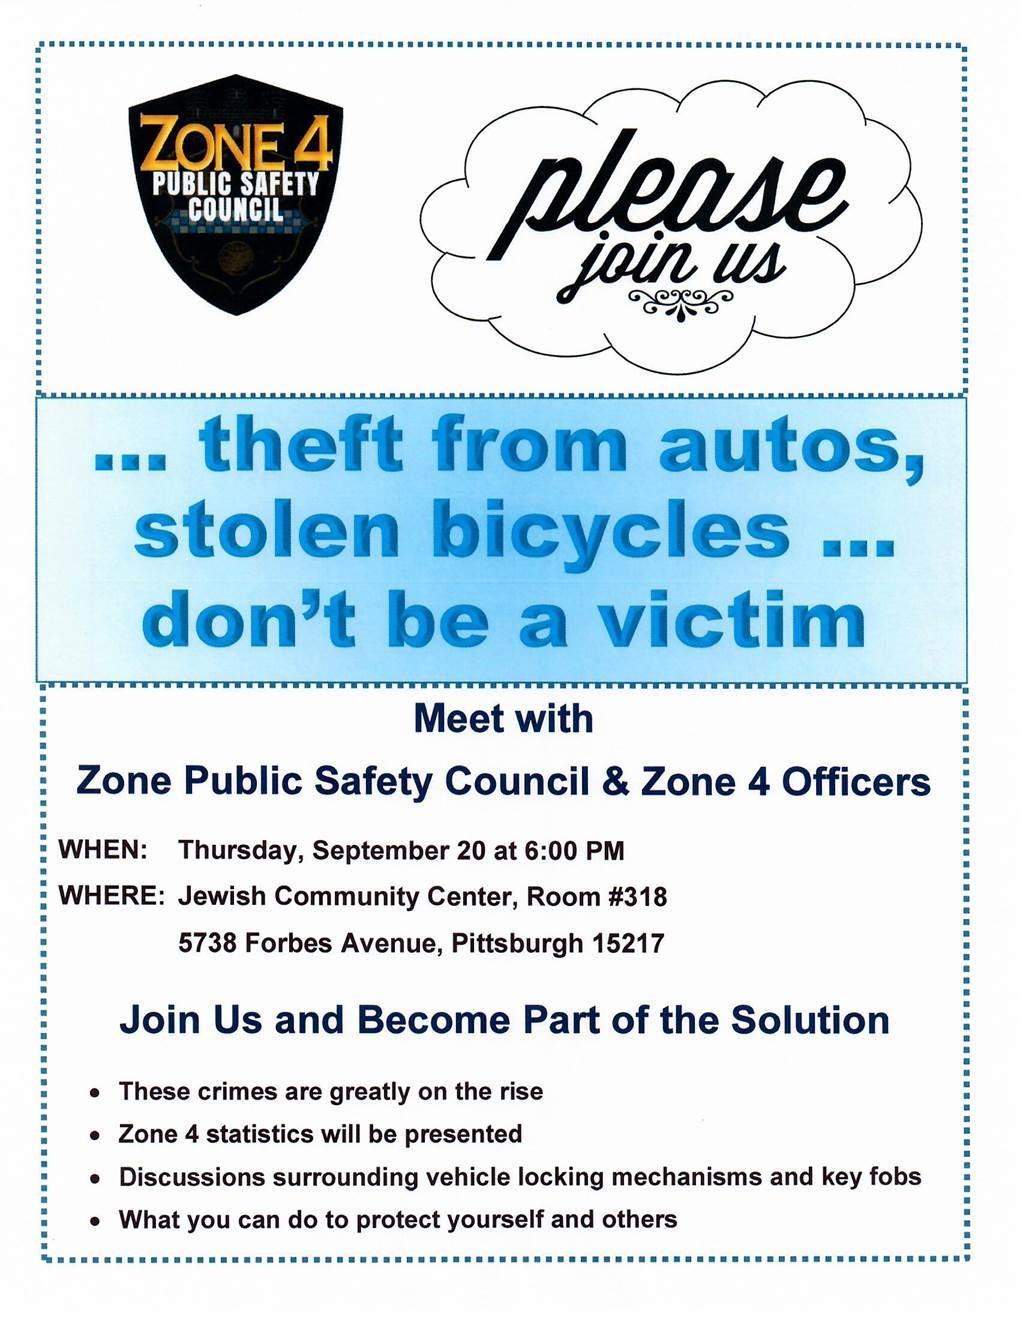 zone 4 public safety mtn.jpg